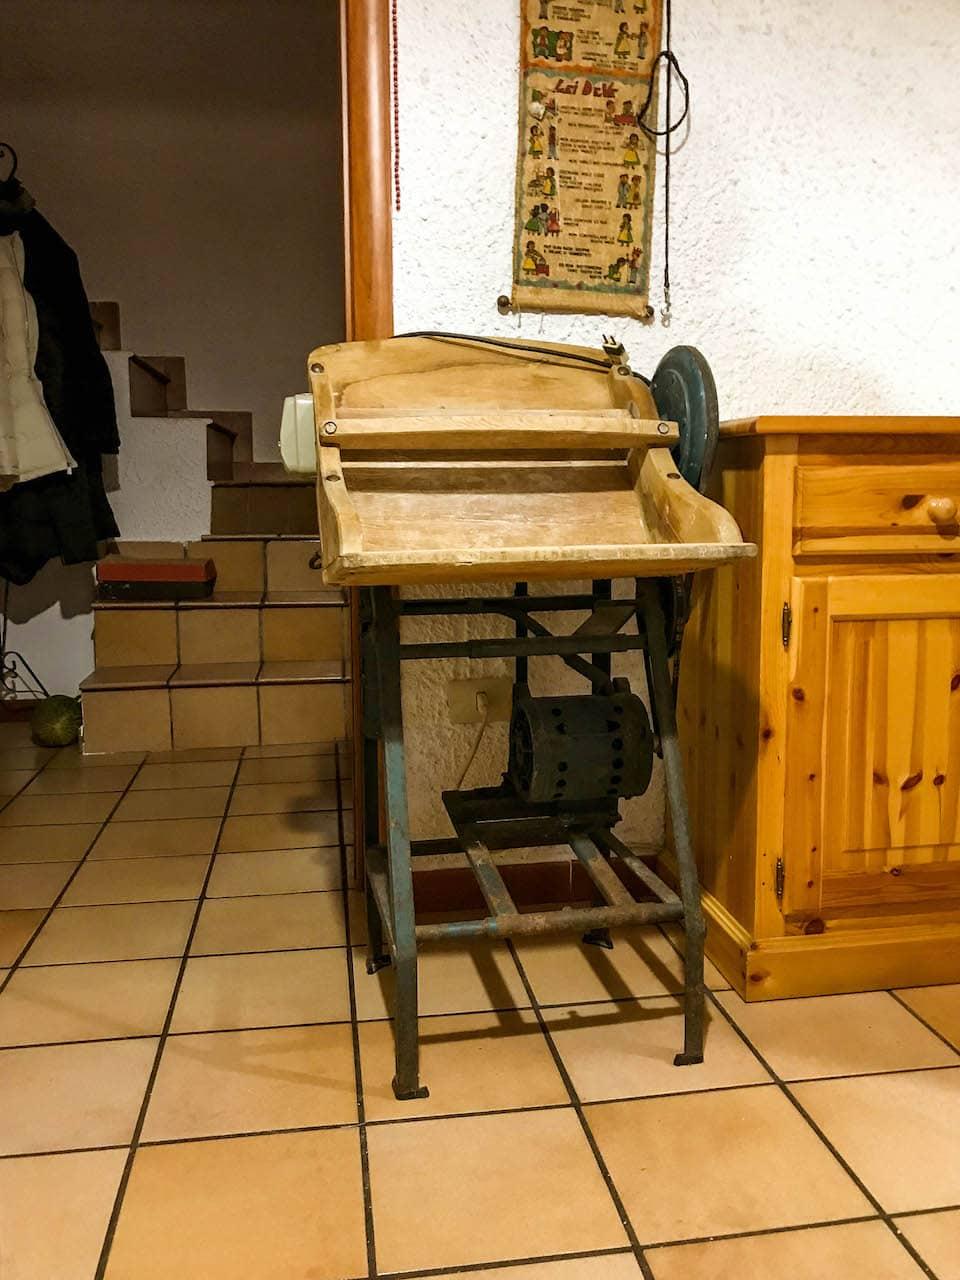 The Kneading Machine